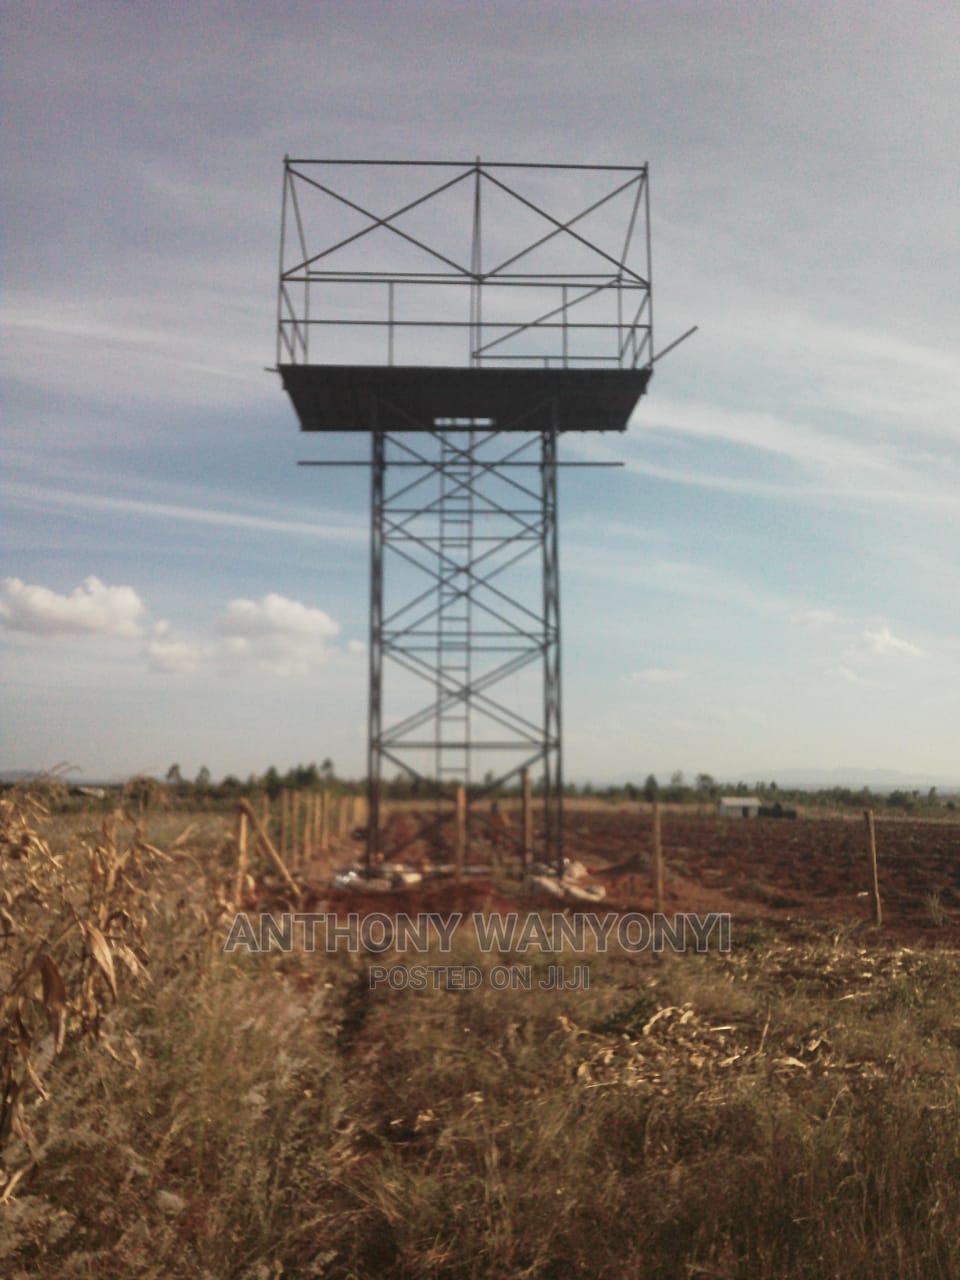 Tank Tower in Kenya, Water Tank in Kenya Embu | Other Repair & Construction Items for sale in Central Ward, Embu, Kenya